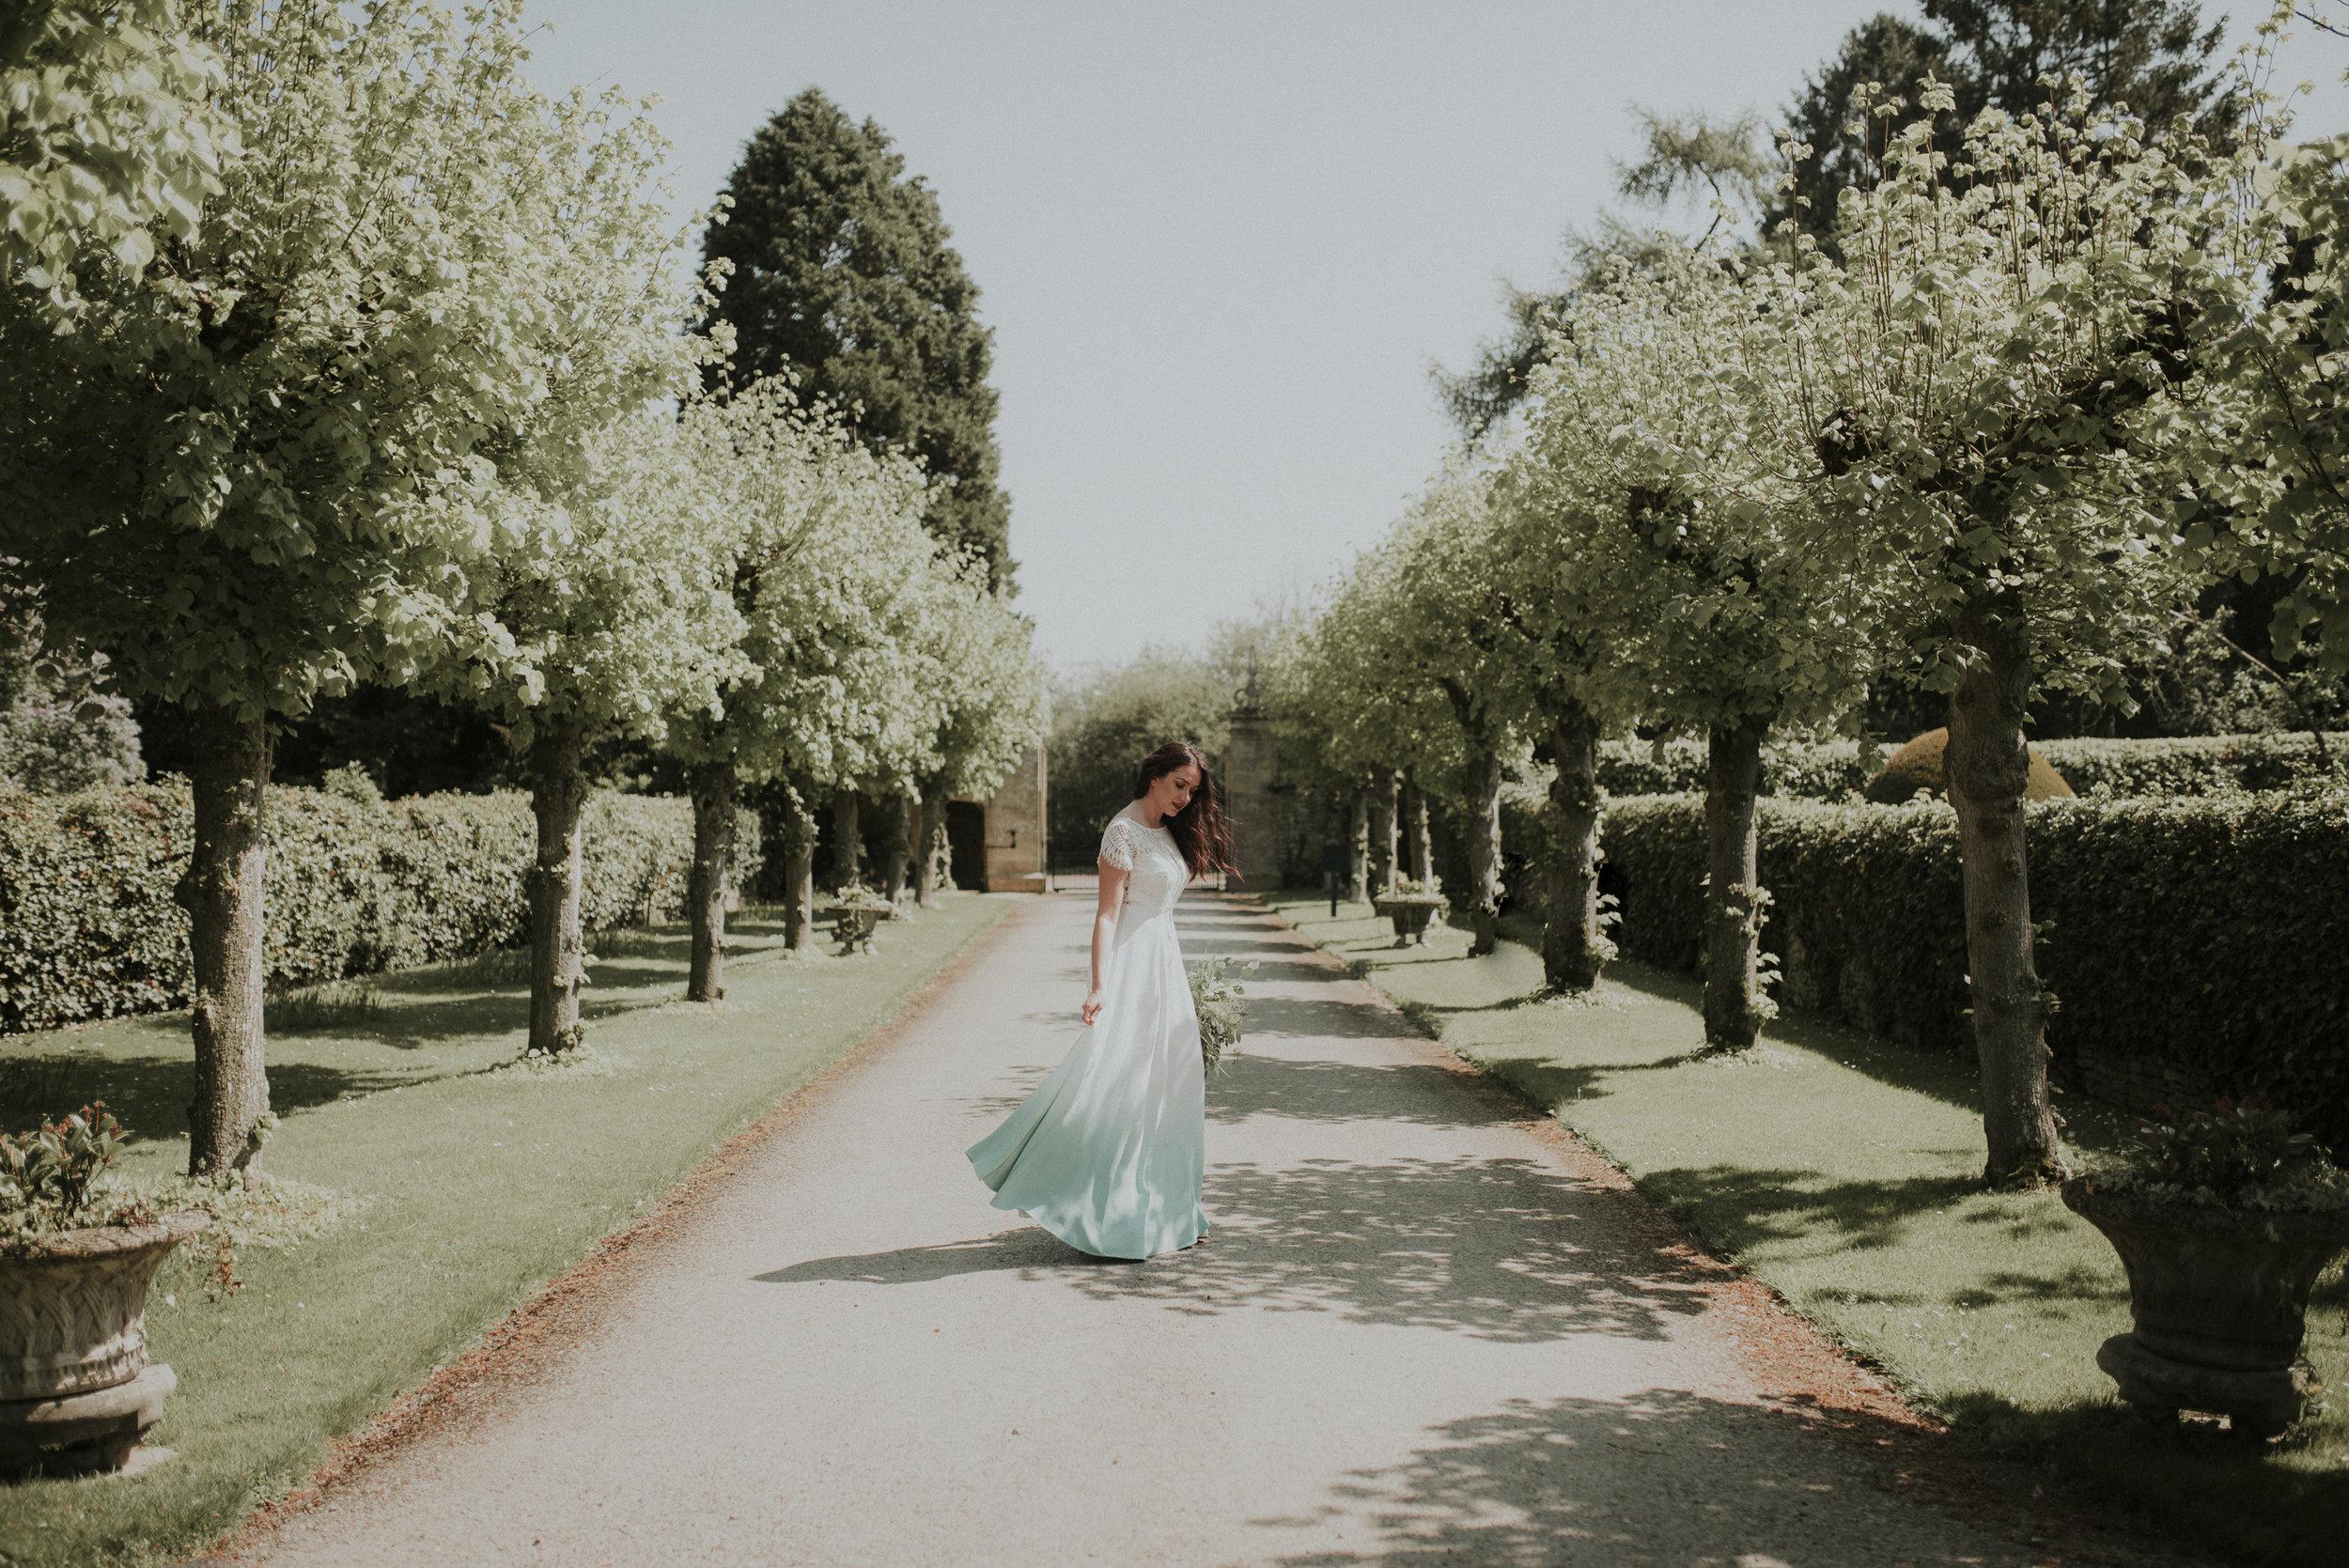 Outdoor wedding photographer Oxfordshire